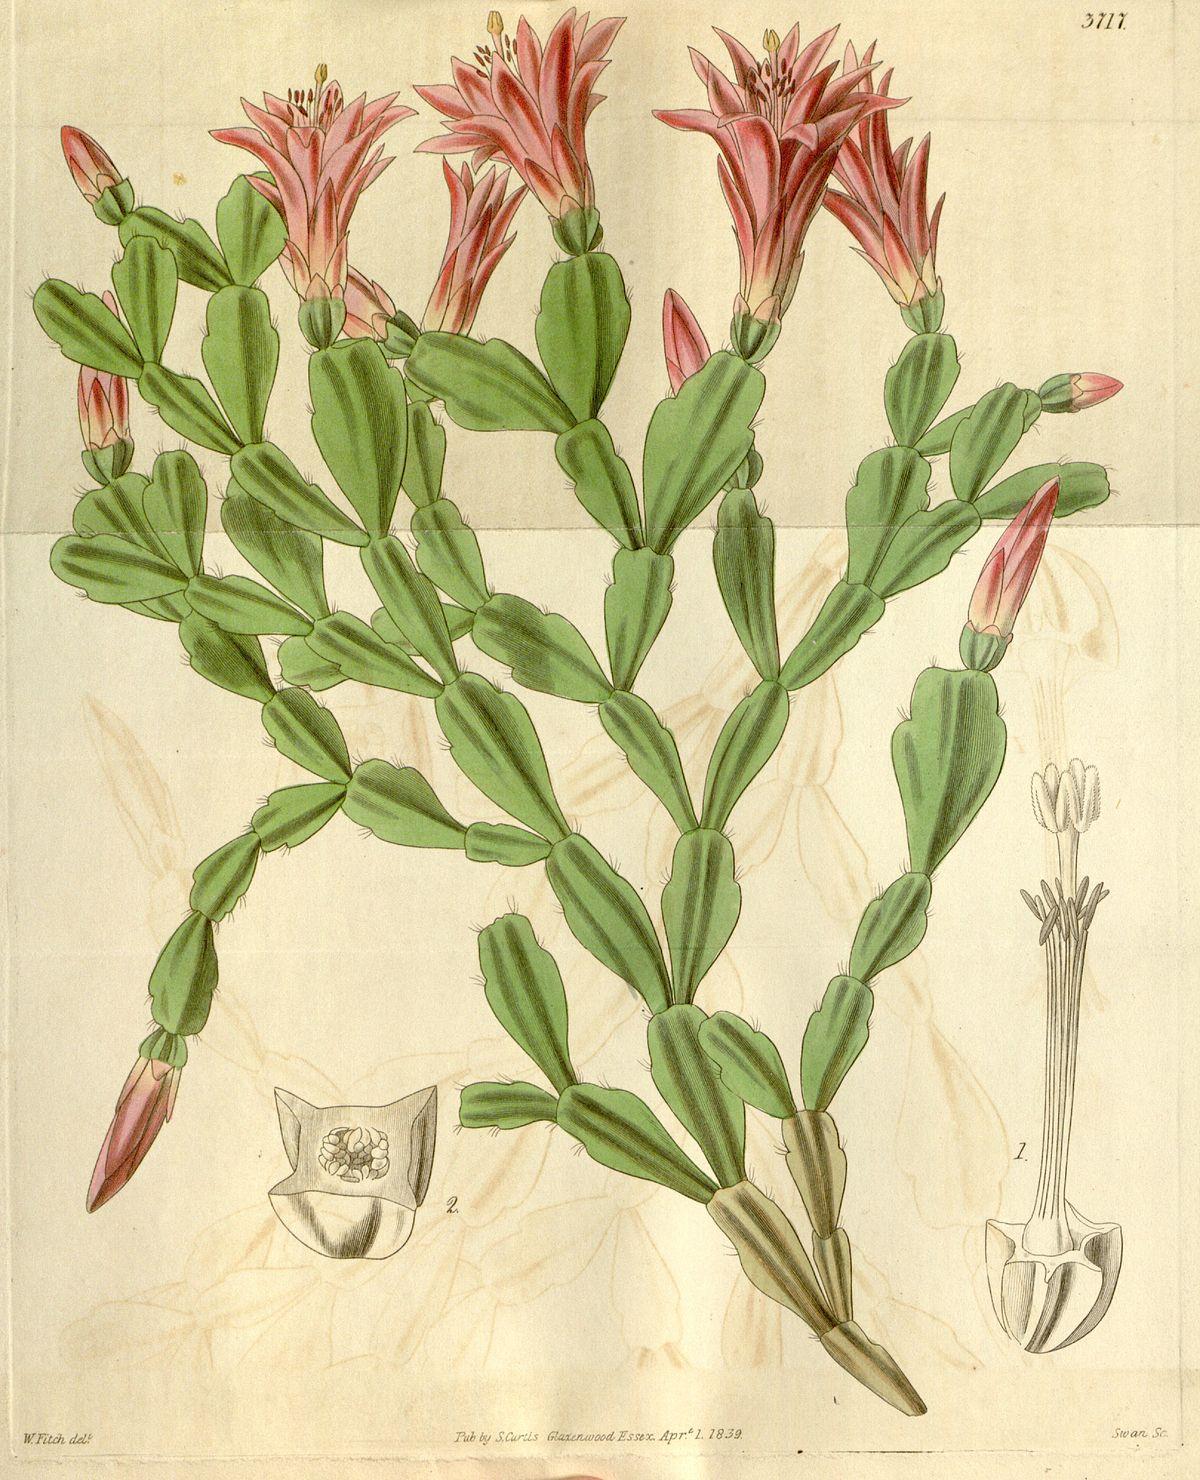 Schlumbergera russelliana (Epiphyllum russellianum) Bot. Mag. 66. 3717. 1839.jpg